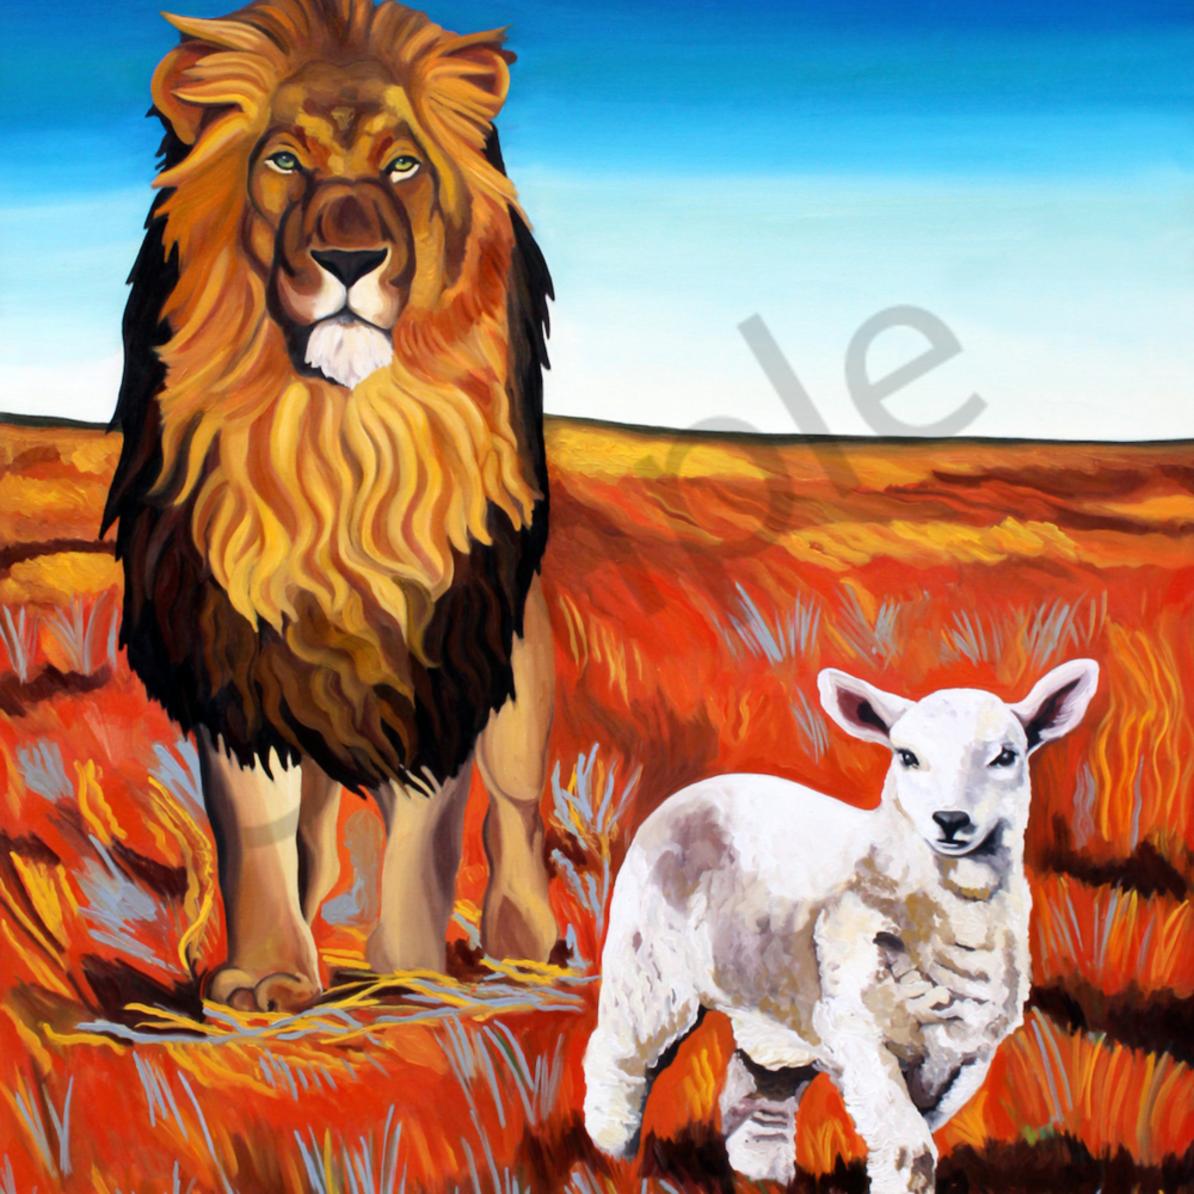 Capture the lamb and the lion by daniel zamitiz ceyv93